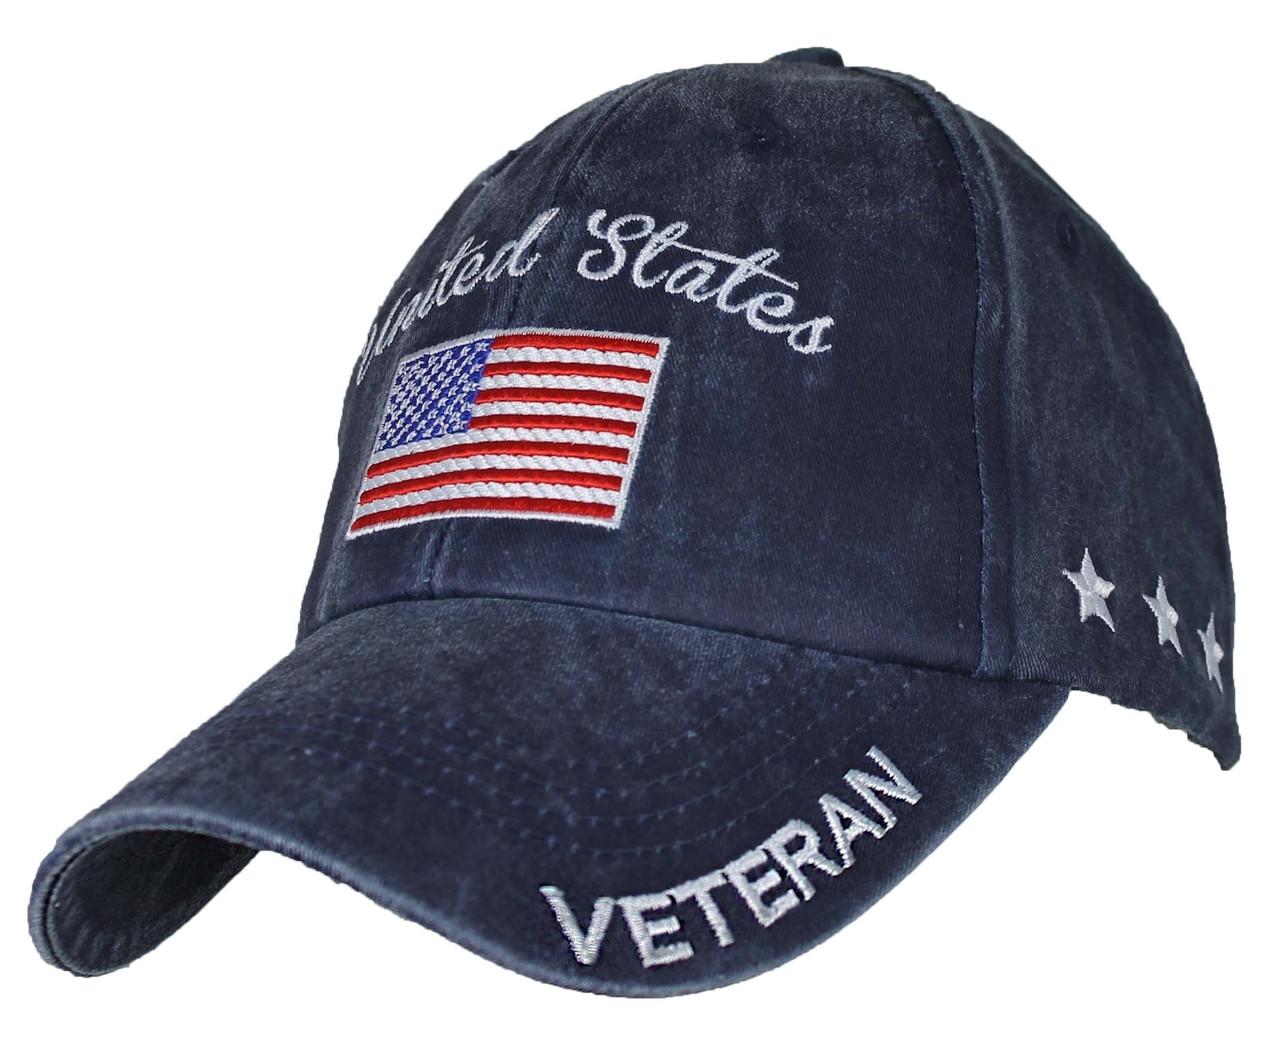 7d5b617f0fd8a ... hats for adf92 d99e0  where can i buy us military veteran u.s. military  with flag washed navy blue baseball cap